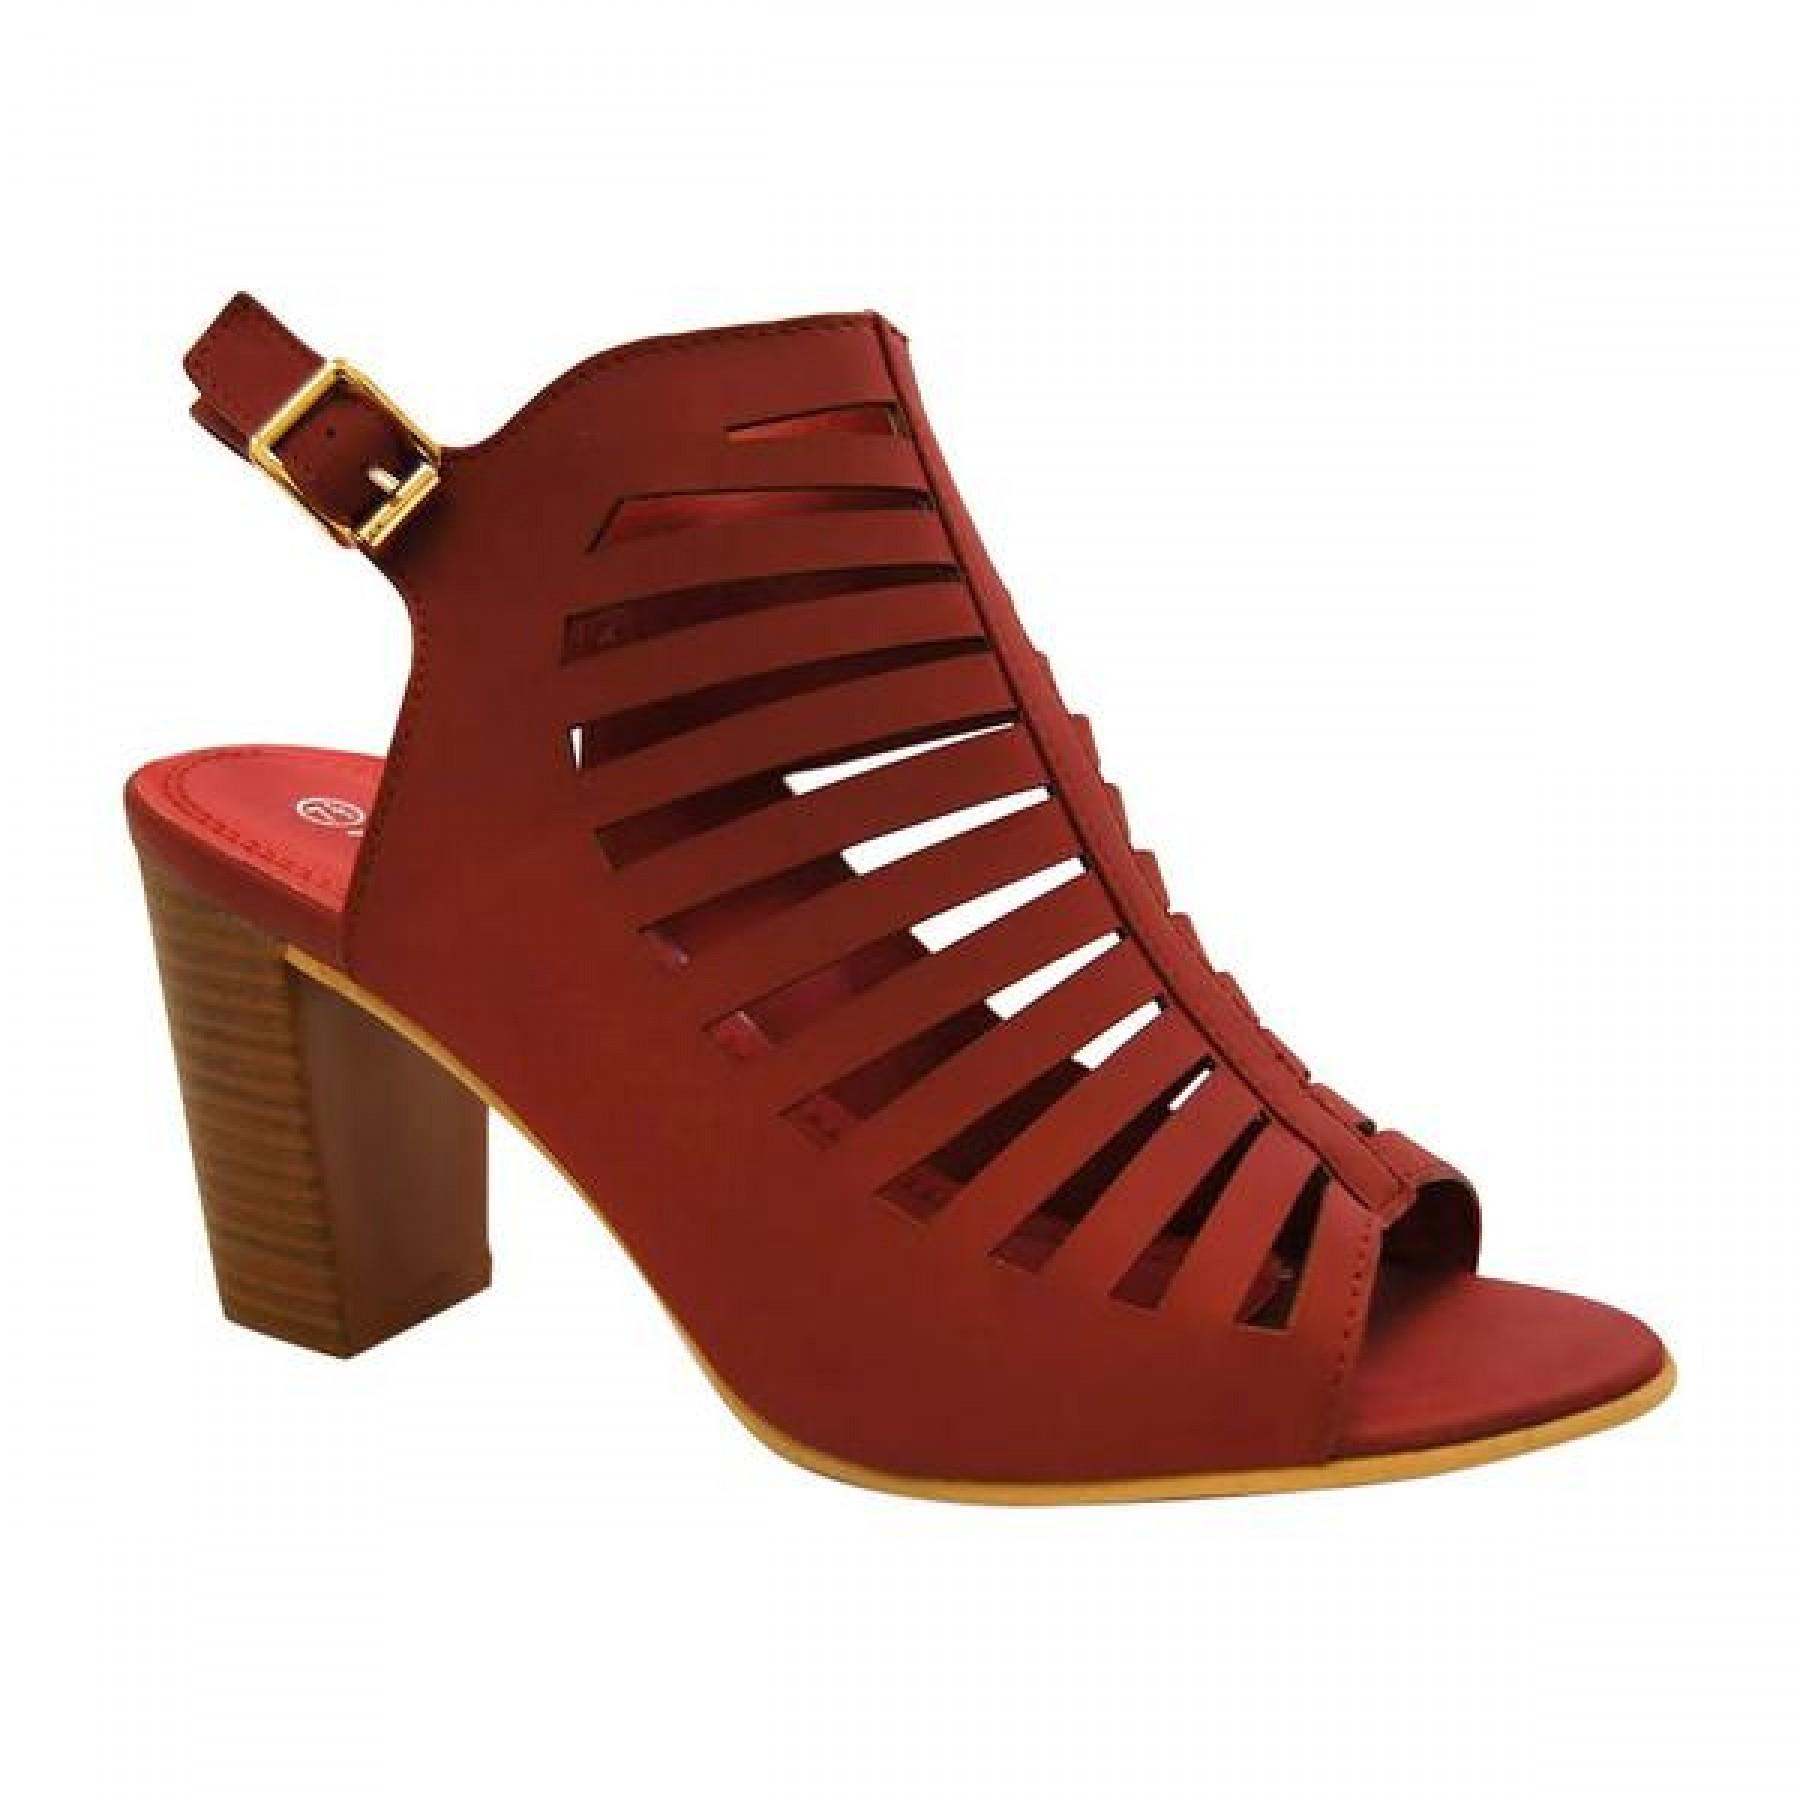 Women's Burgundy Manmade Marinner Stack Heel Sandal with Gladiator-Style Vamp